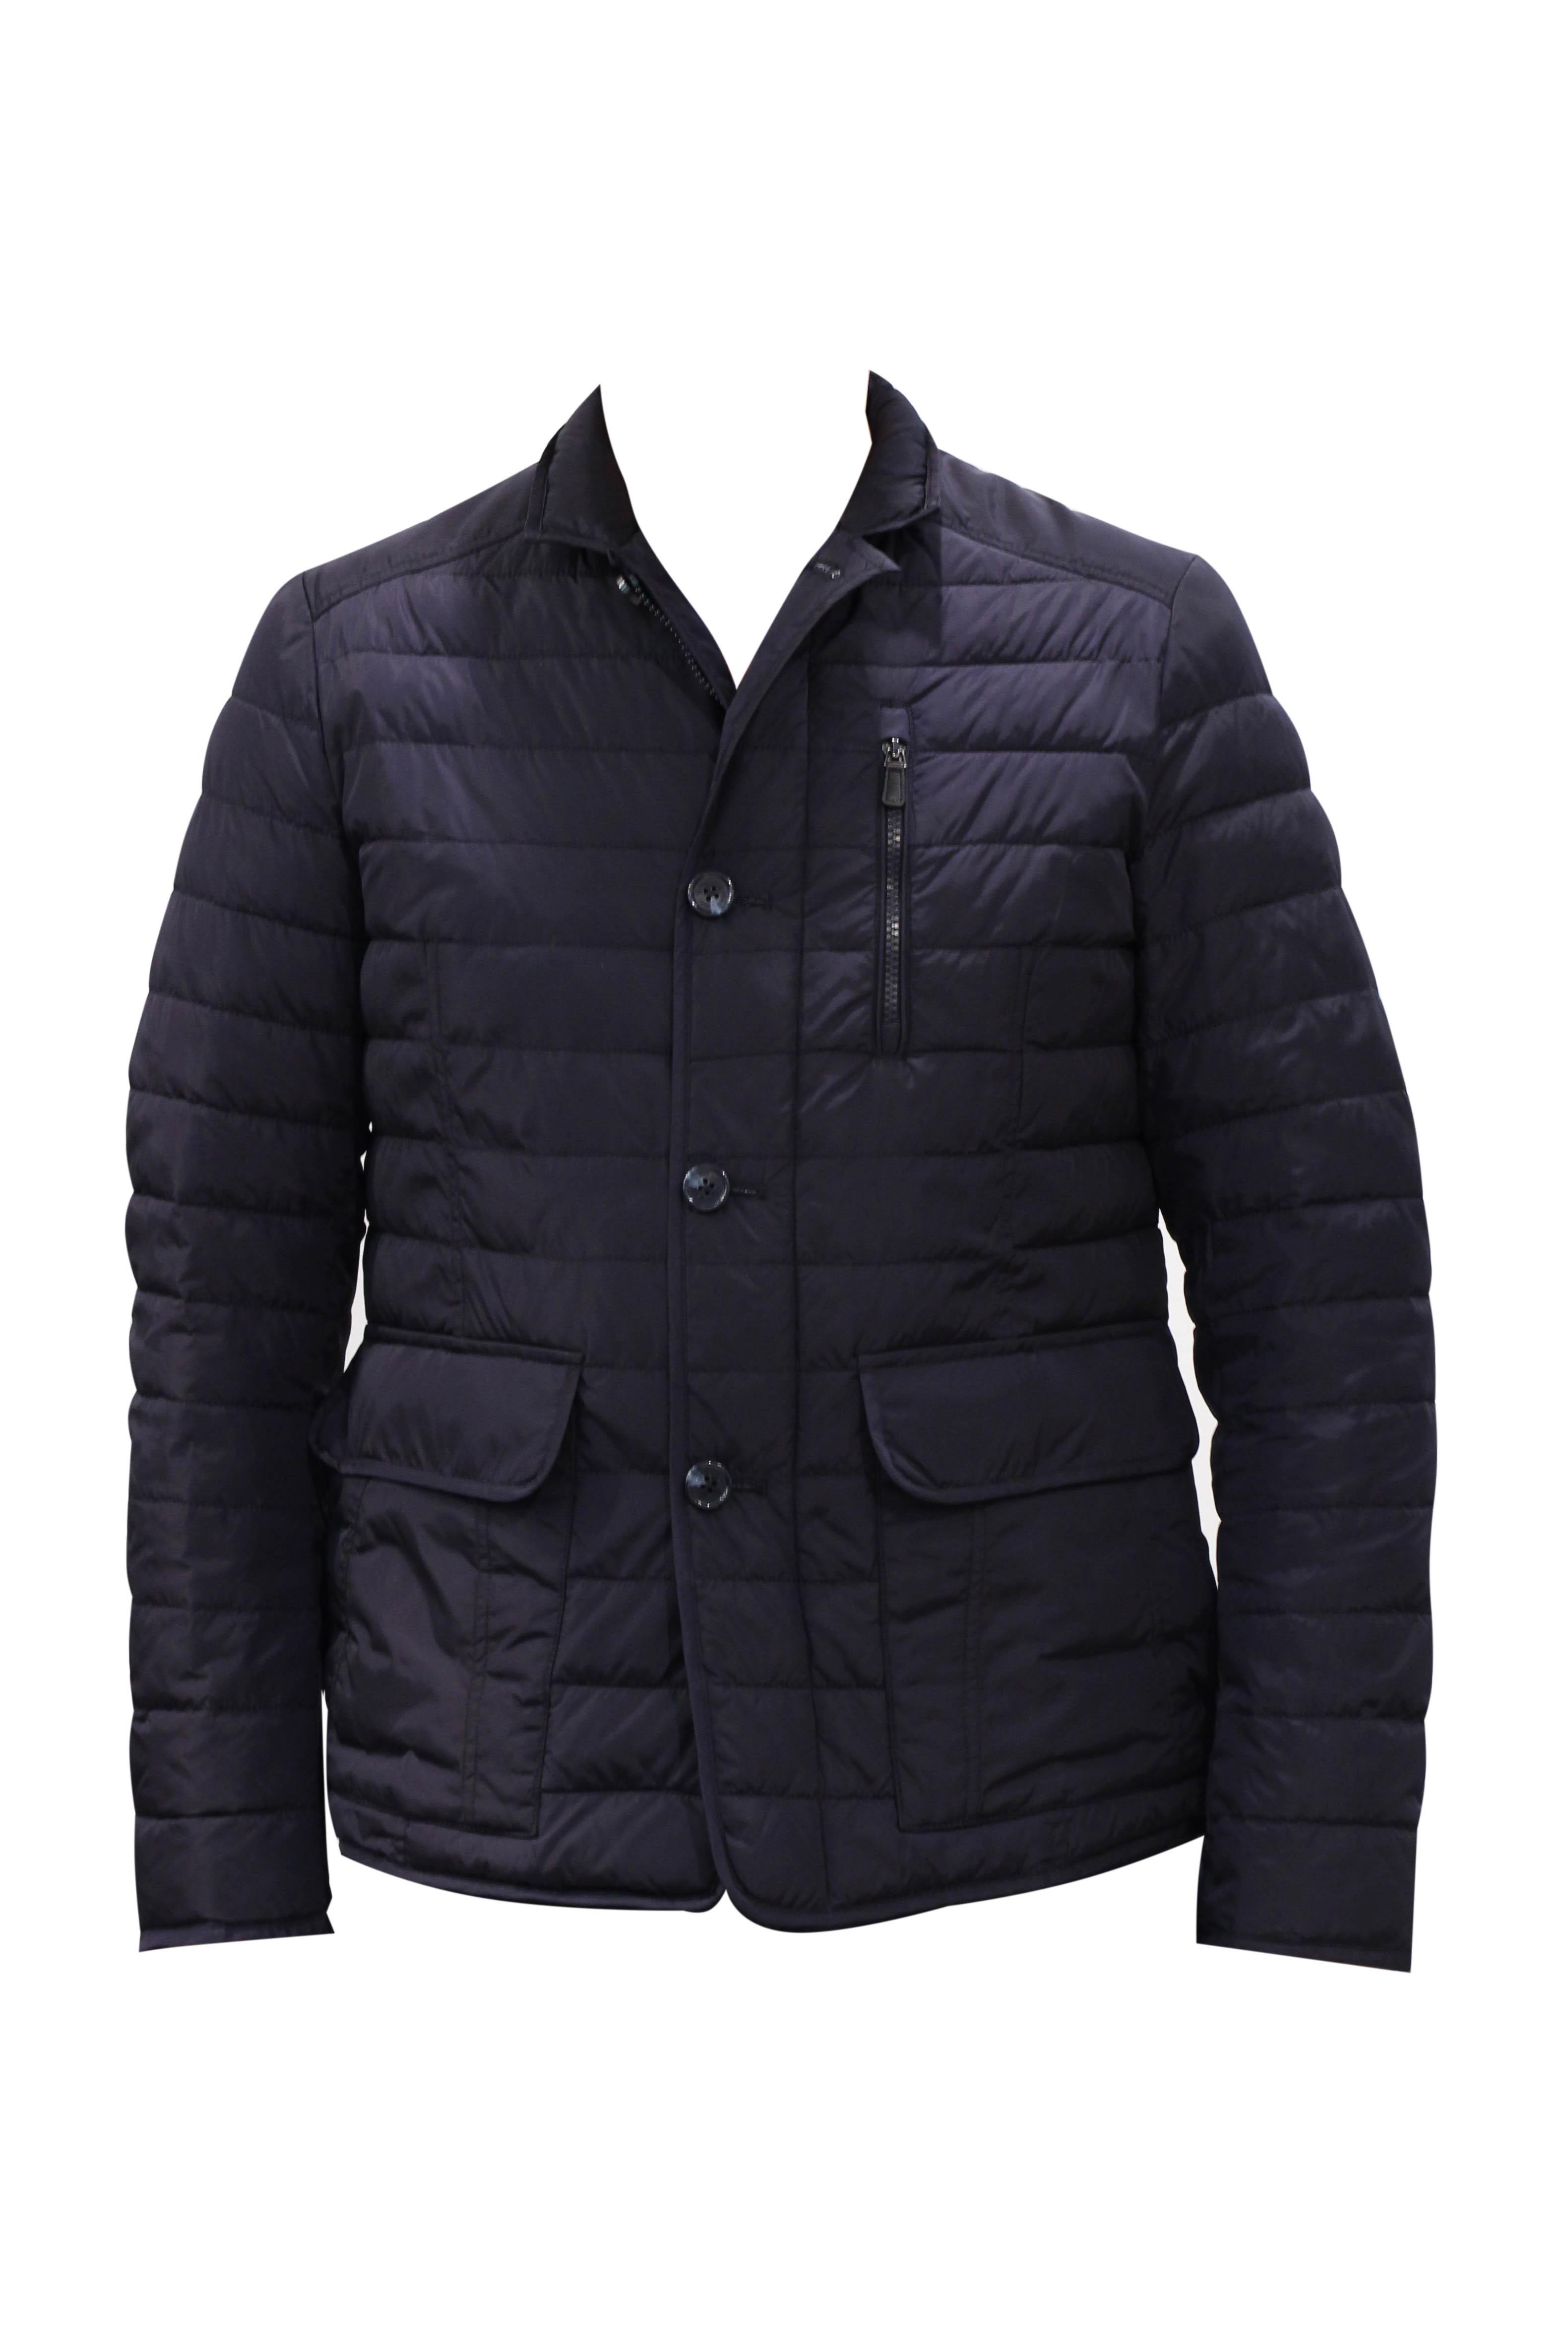 Демисезонная приталенная куртка Санкт-Петербург BriksTon